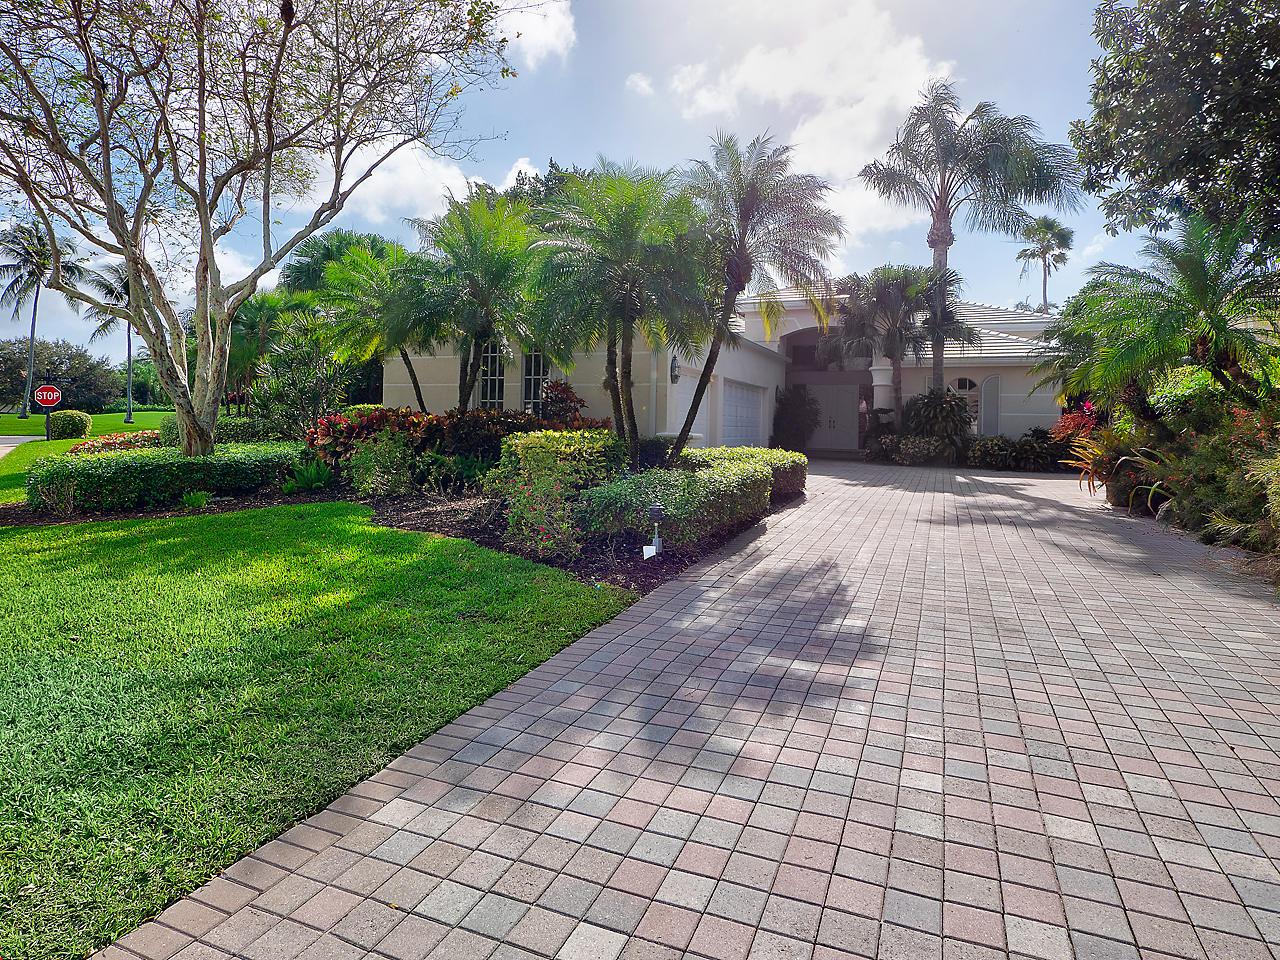 1101 Crystal Drive, Palm Beach Gardens, Florida 33418, 3 Bedrooms Bedrooms, ,3 BathroomsBathrooms,A,Single family,Crystal,RX-10592548